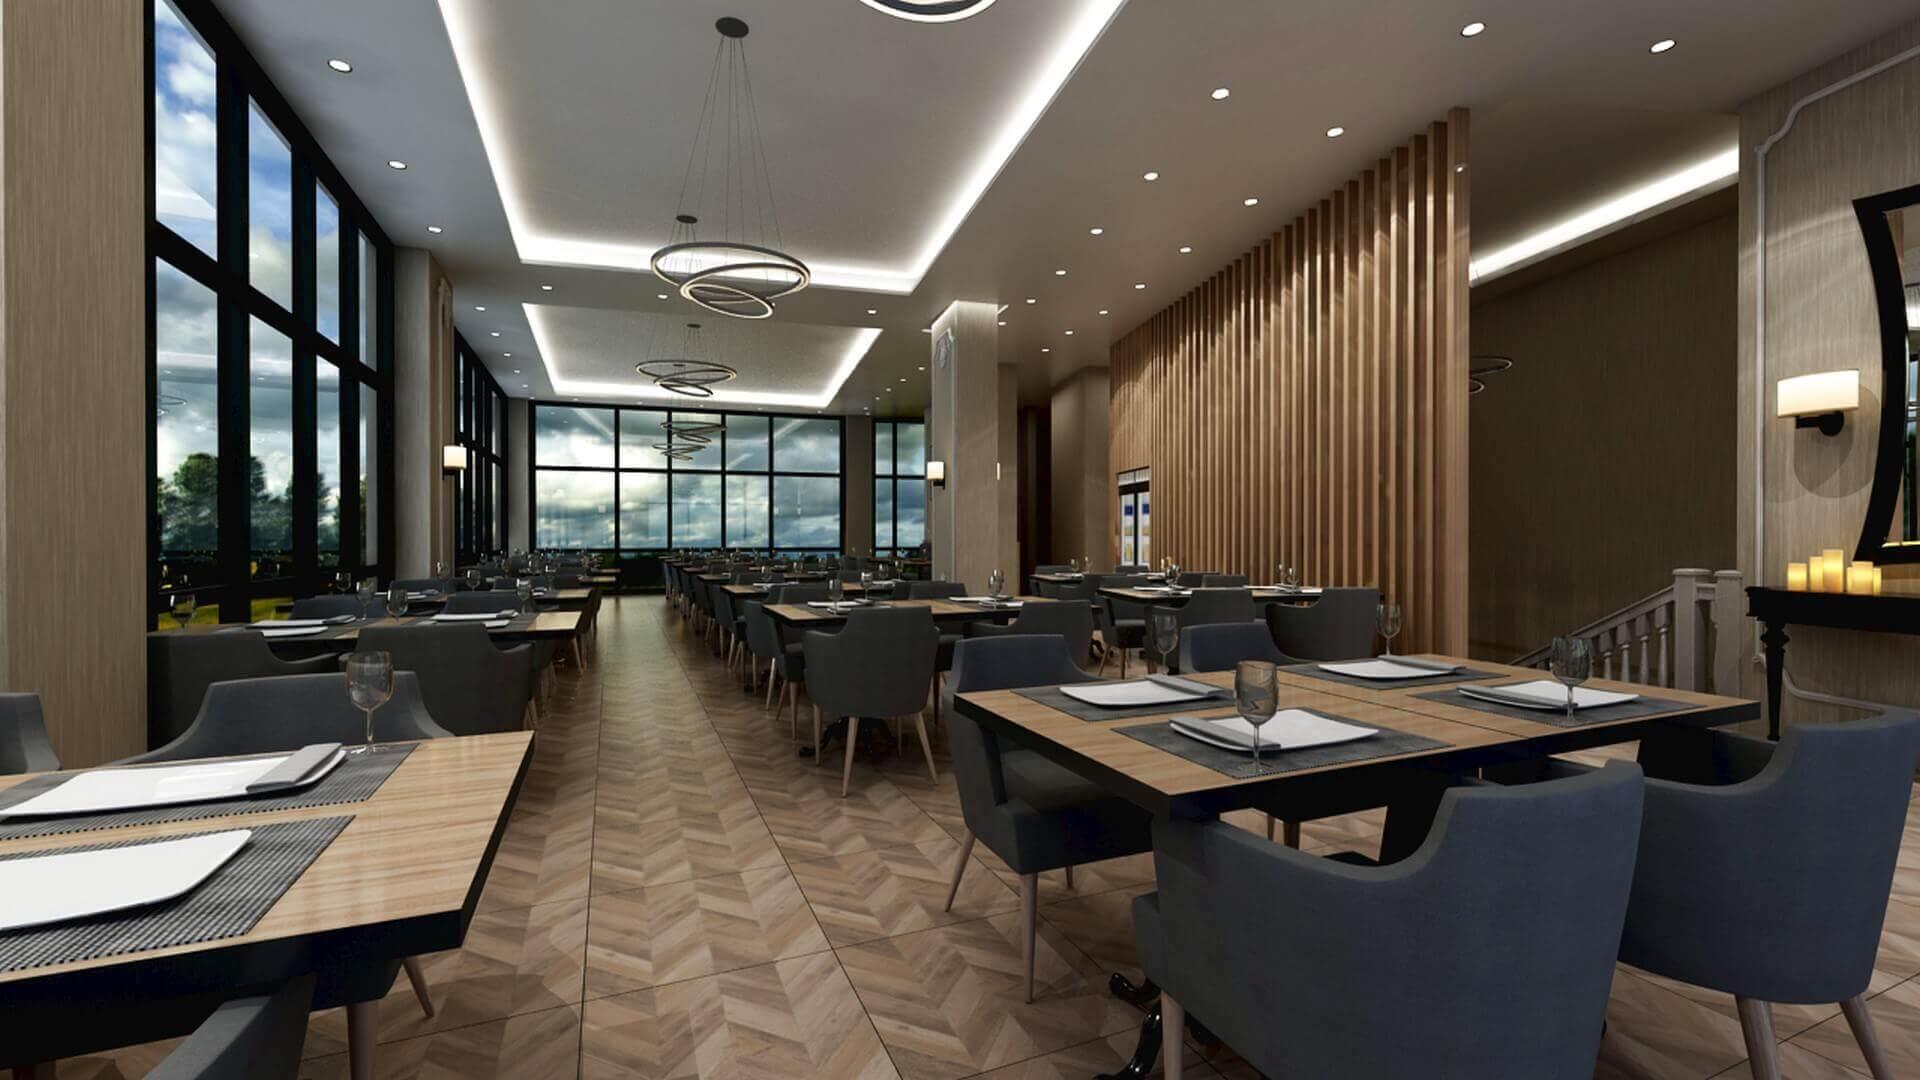 restoran tasarımı 2075 Otonomi Restoran Restoranlar